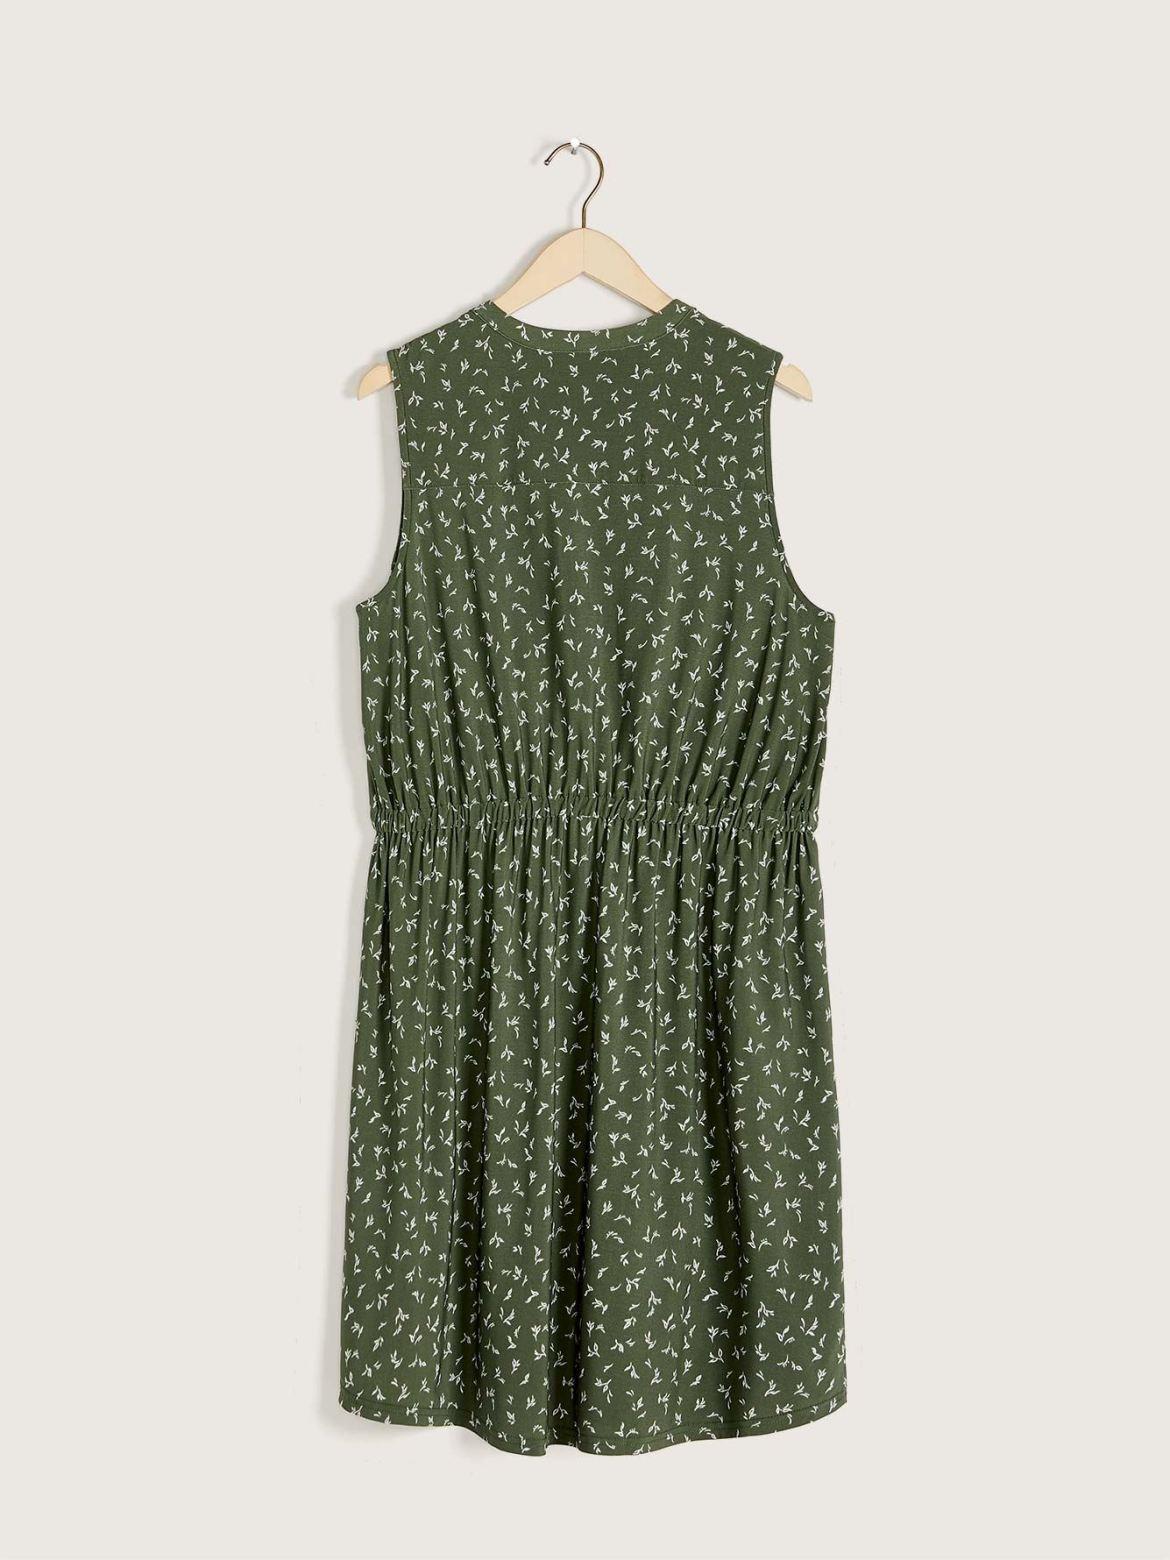 Sleeveless Fit & Flare Dress - Addition Elle